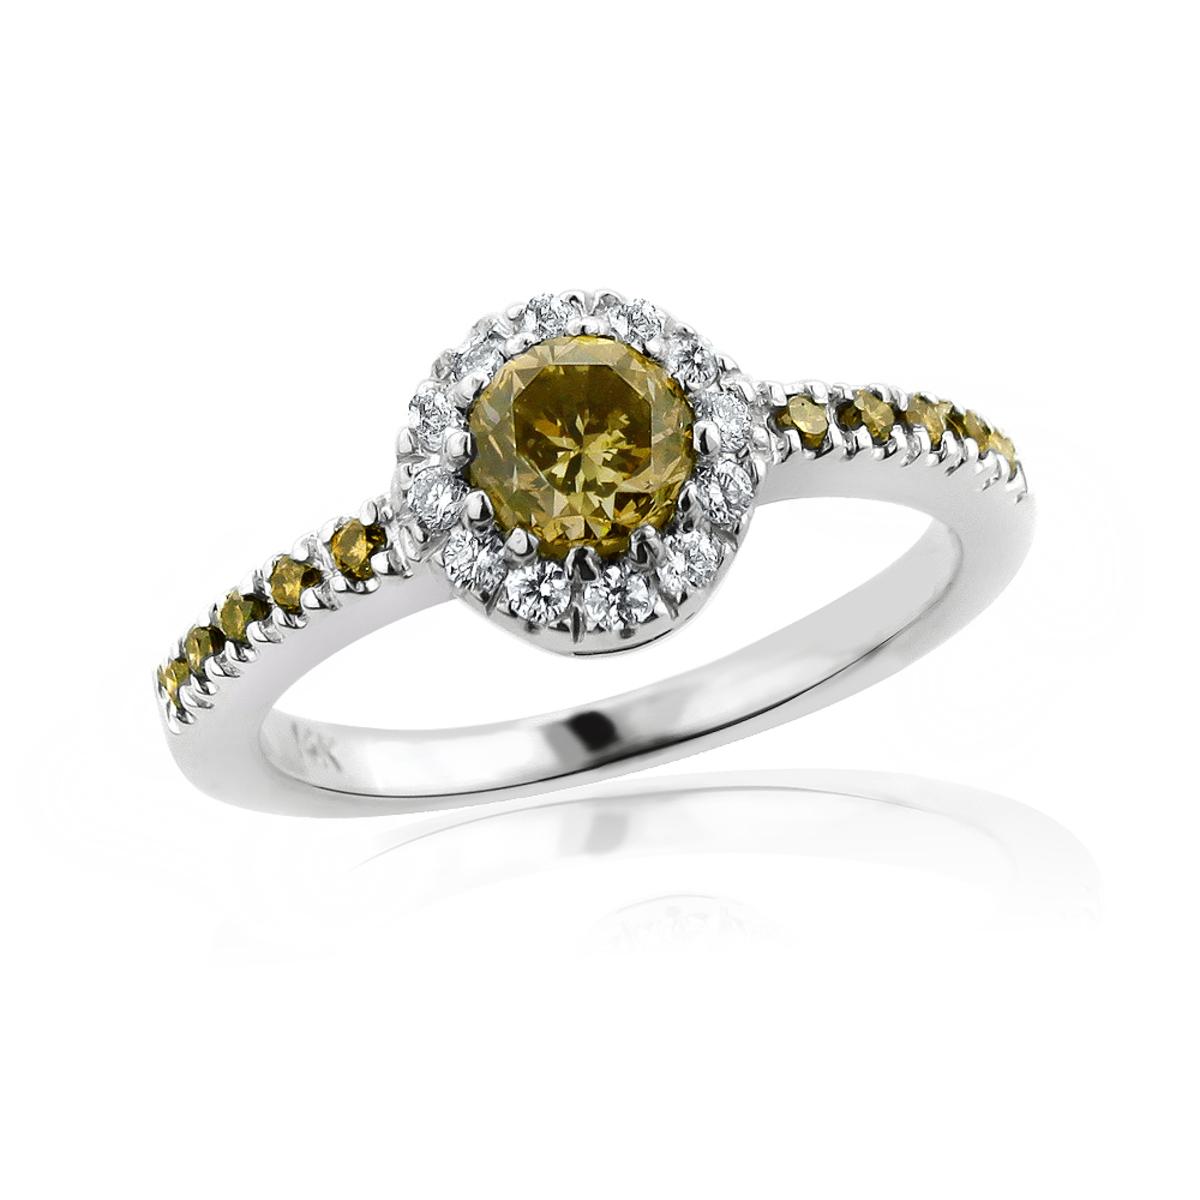 Ultra Thin White Brown Diamond Engagement Ring 14K Gold 0.72ct Halo